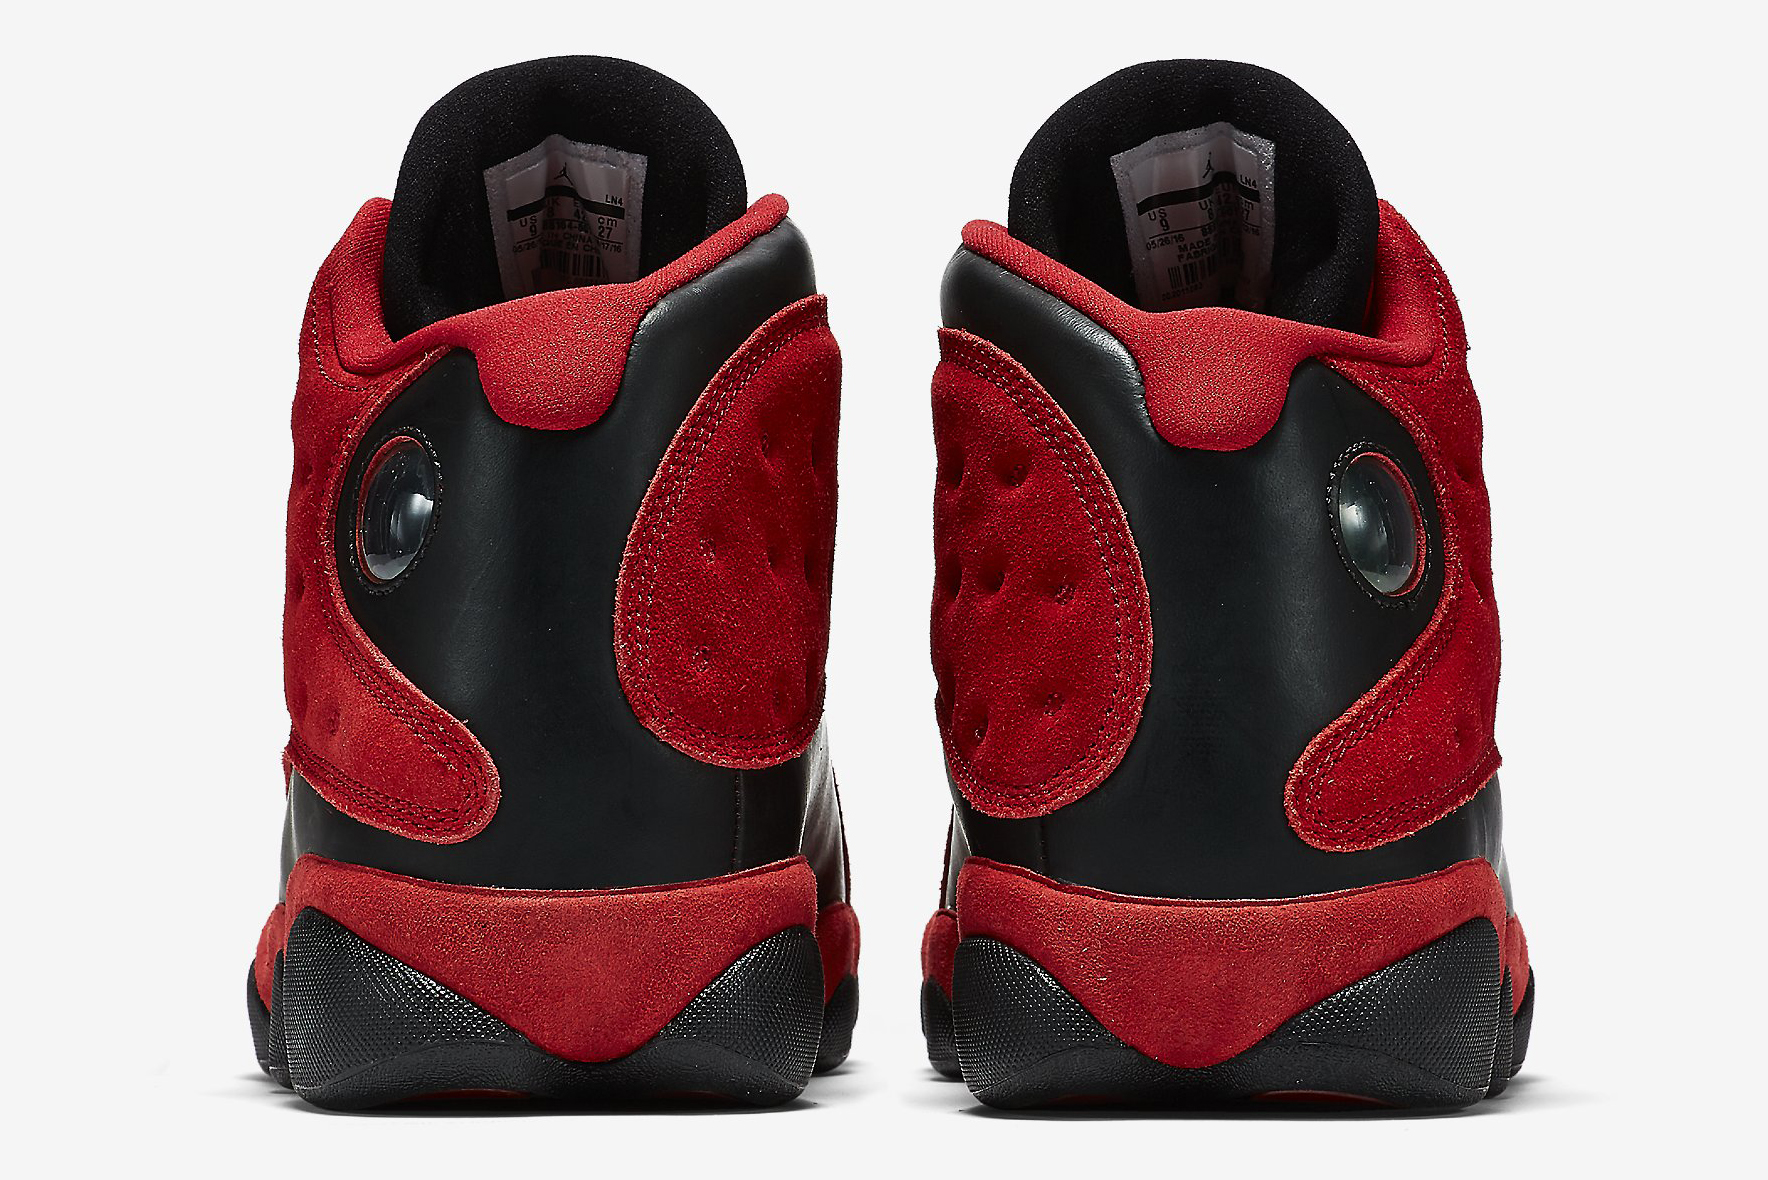 6e111bee6d1183 Image via Nike Singles Day Air Jordan 13 888164-601 Heel